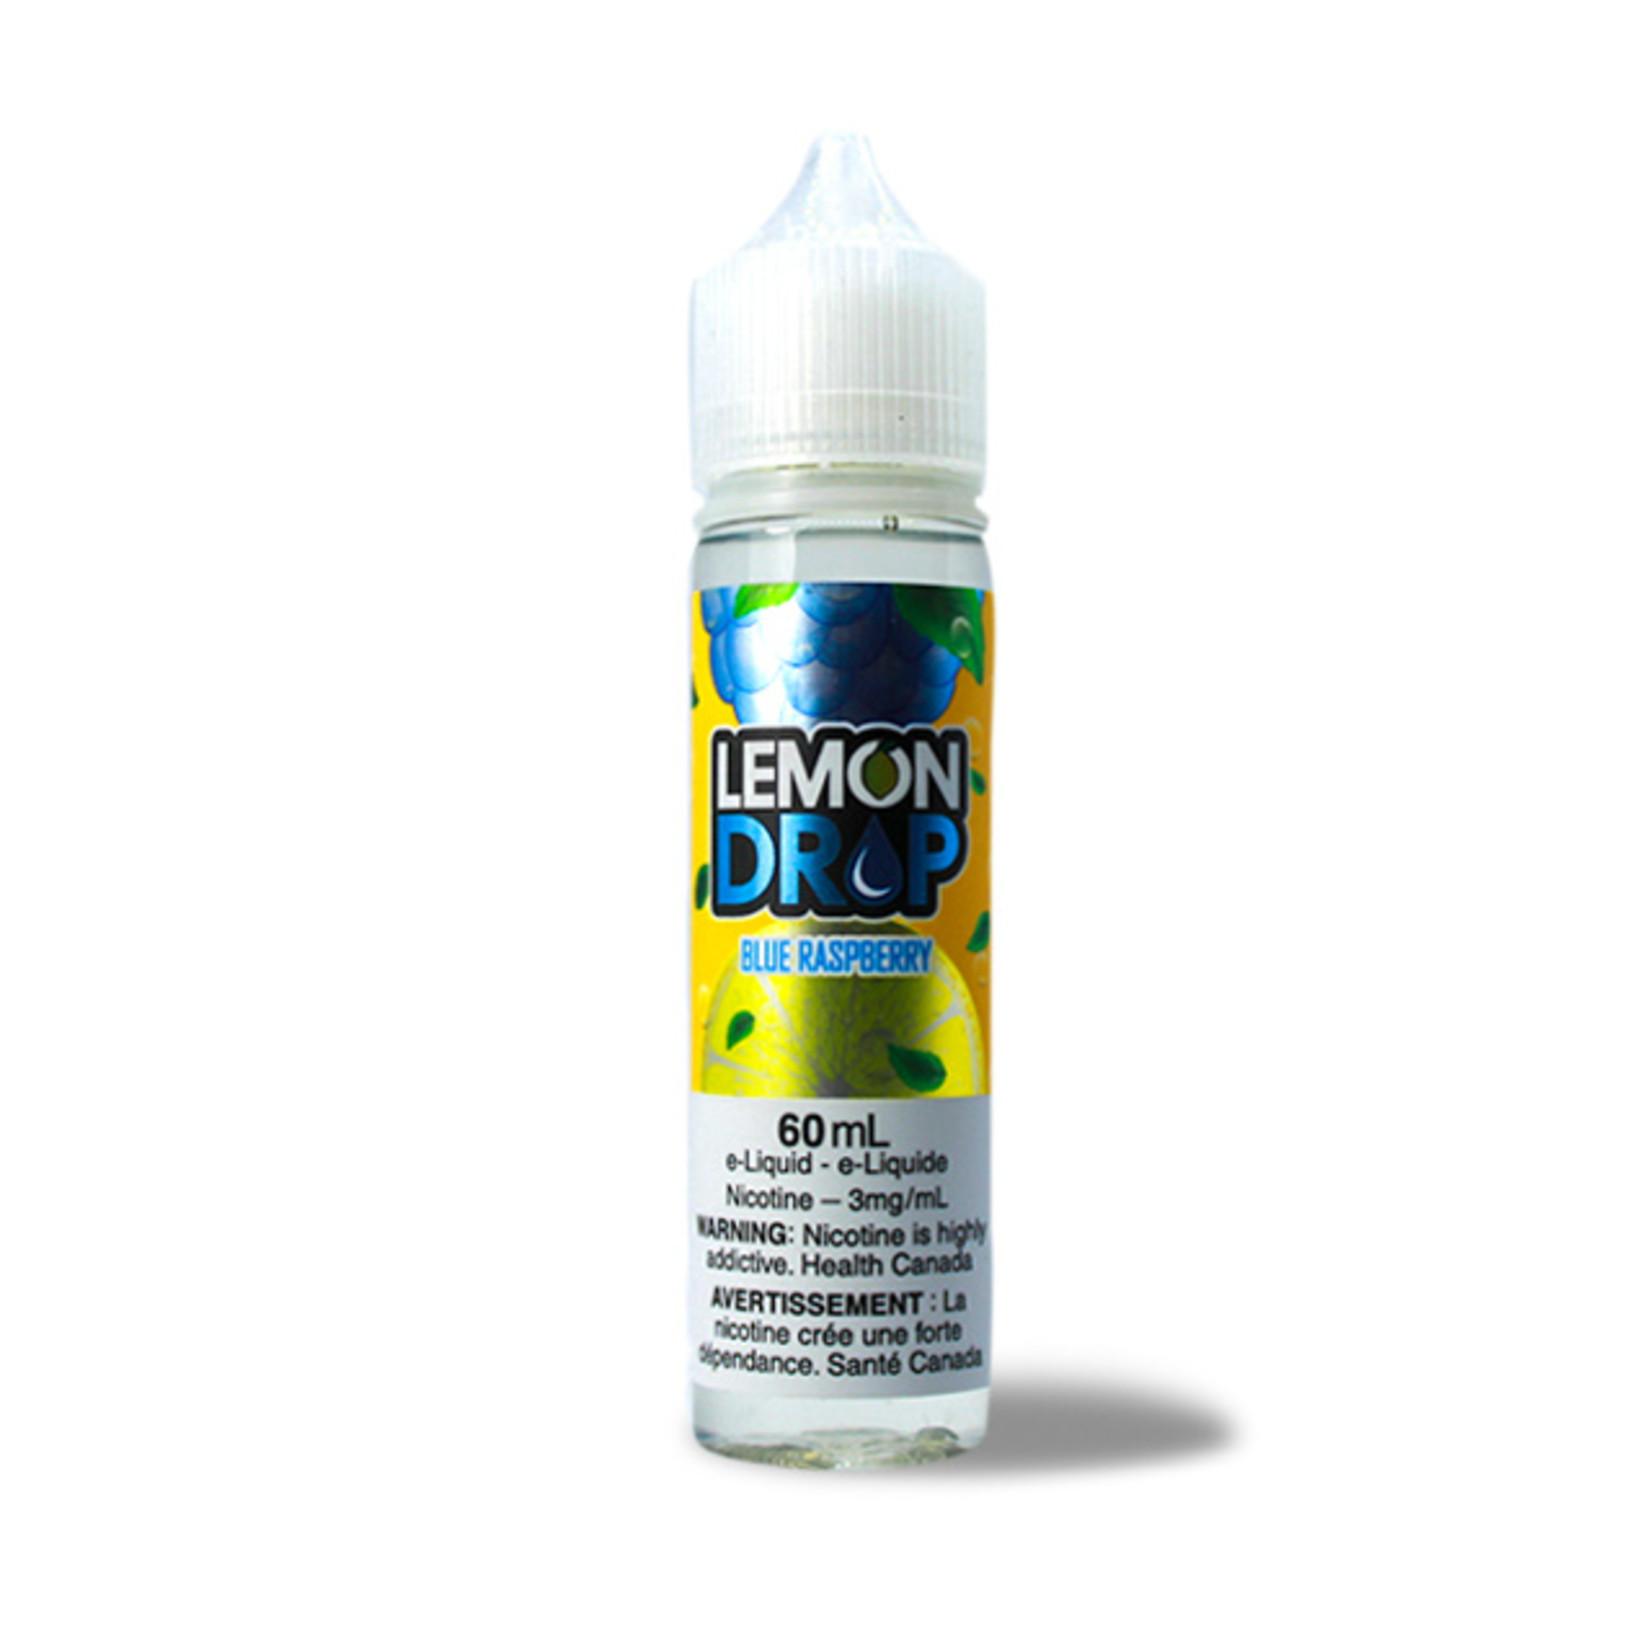 Lemon Drops Blue Raspberry